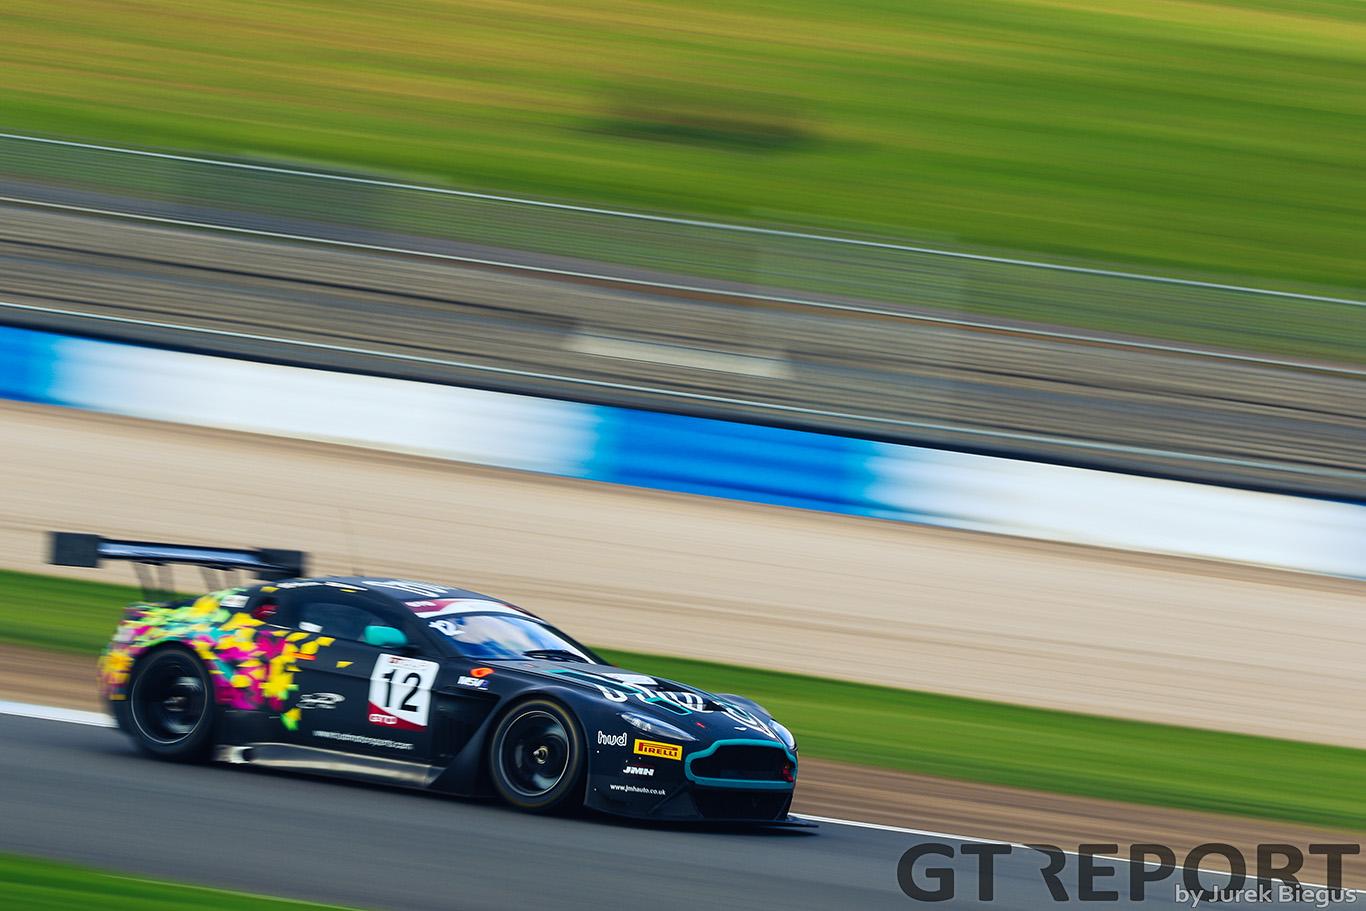 Aston Martin Vantage Gt3 Tech Analysis Gt Report